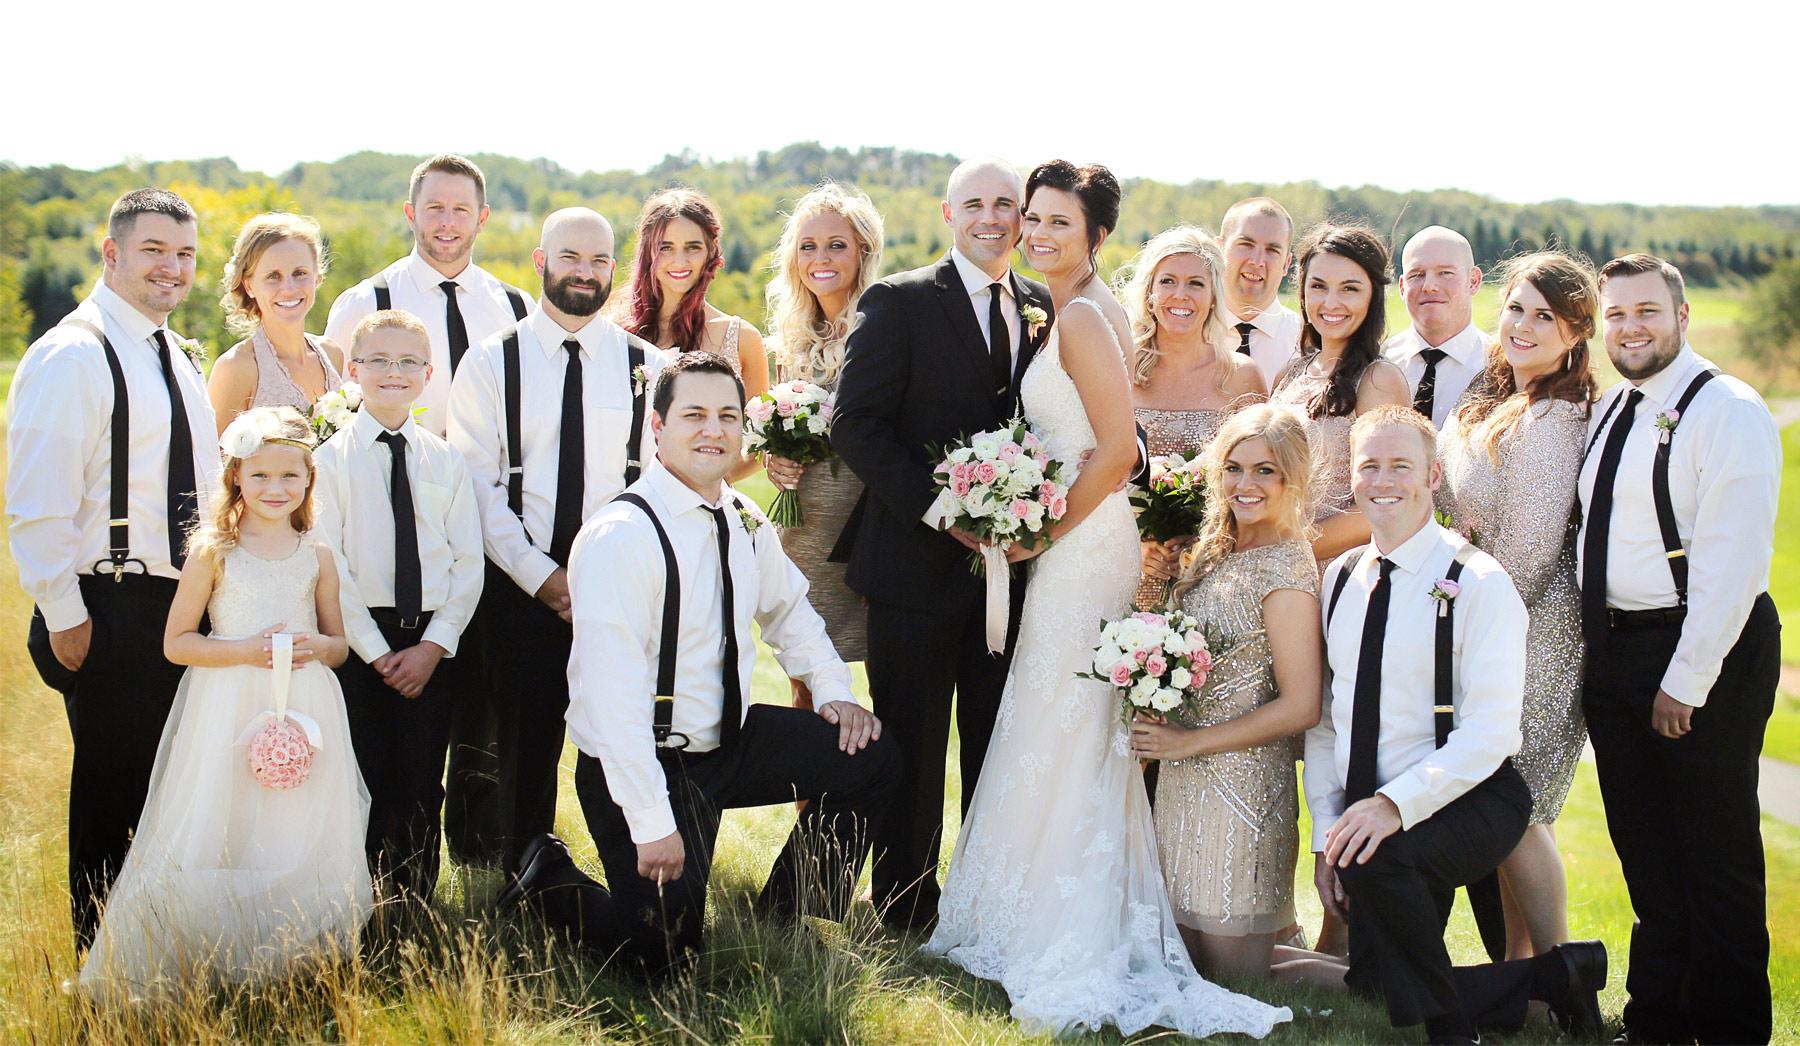 11-Stillwater-Minnesota-Wedding-Photography-by-Vick-Photography-Wedding-Party-Group-Tara-&-Ryan.jpg